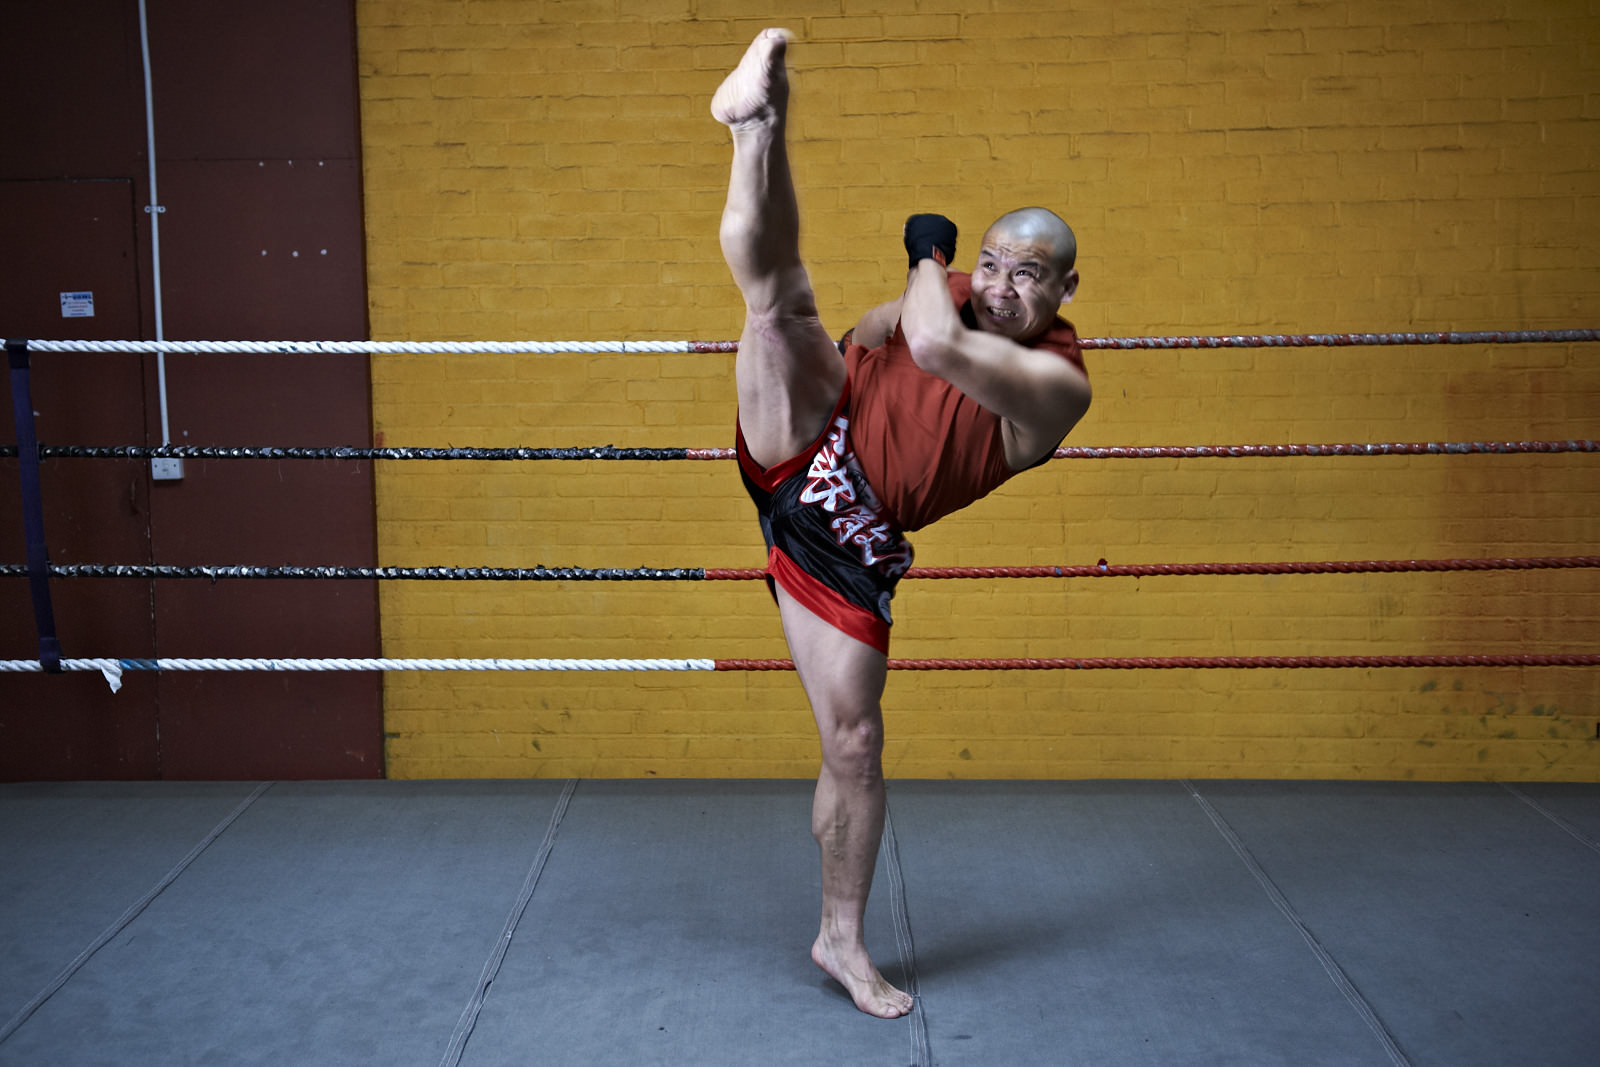 Shaolin temple uk shifu yanzi kick 3.jpg